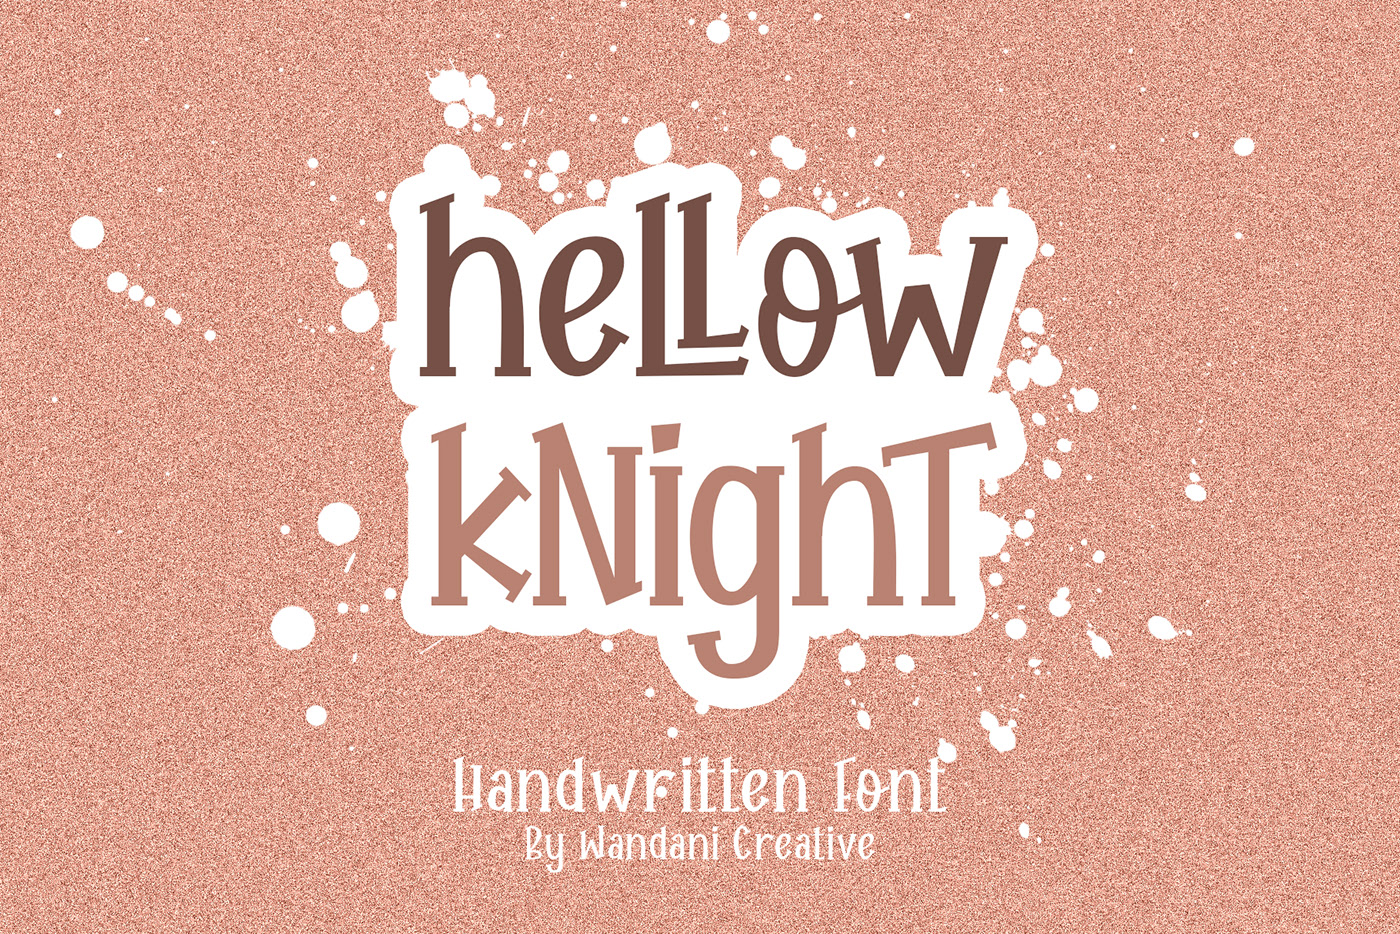 Hellow Knight Free Handwritten Font - script